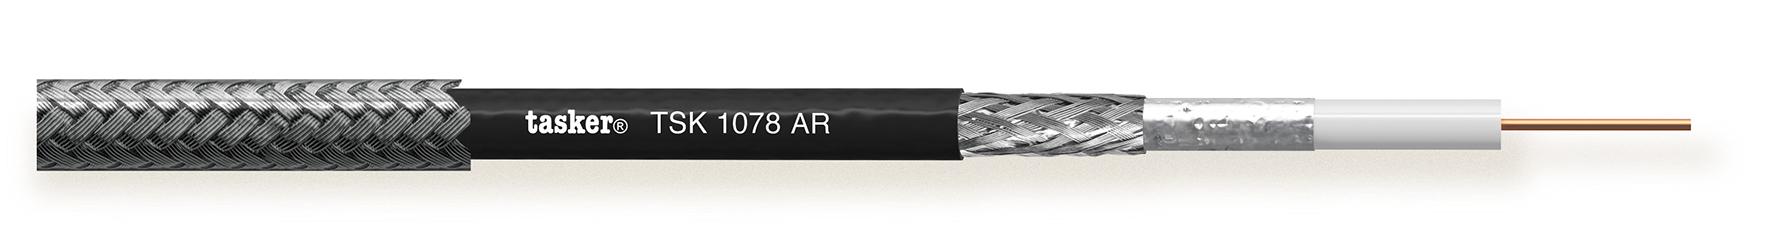 Armored coax kabel HDTV-HD SDI 1x0.52 (75Ohm)<br />TSK1078 AR